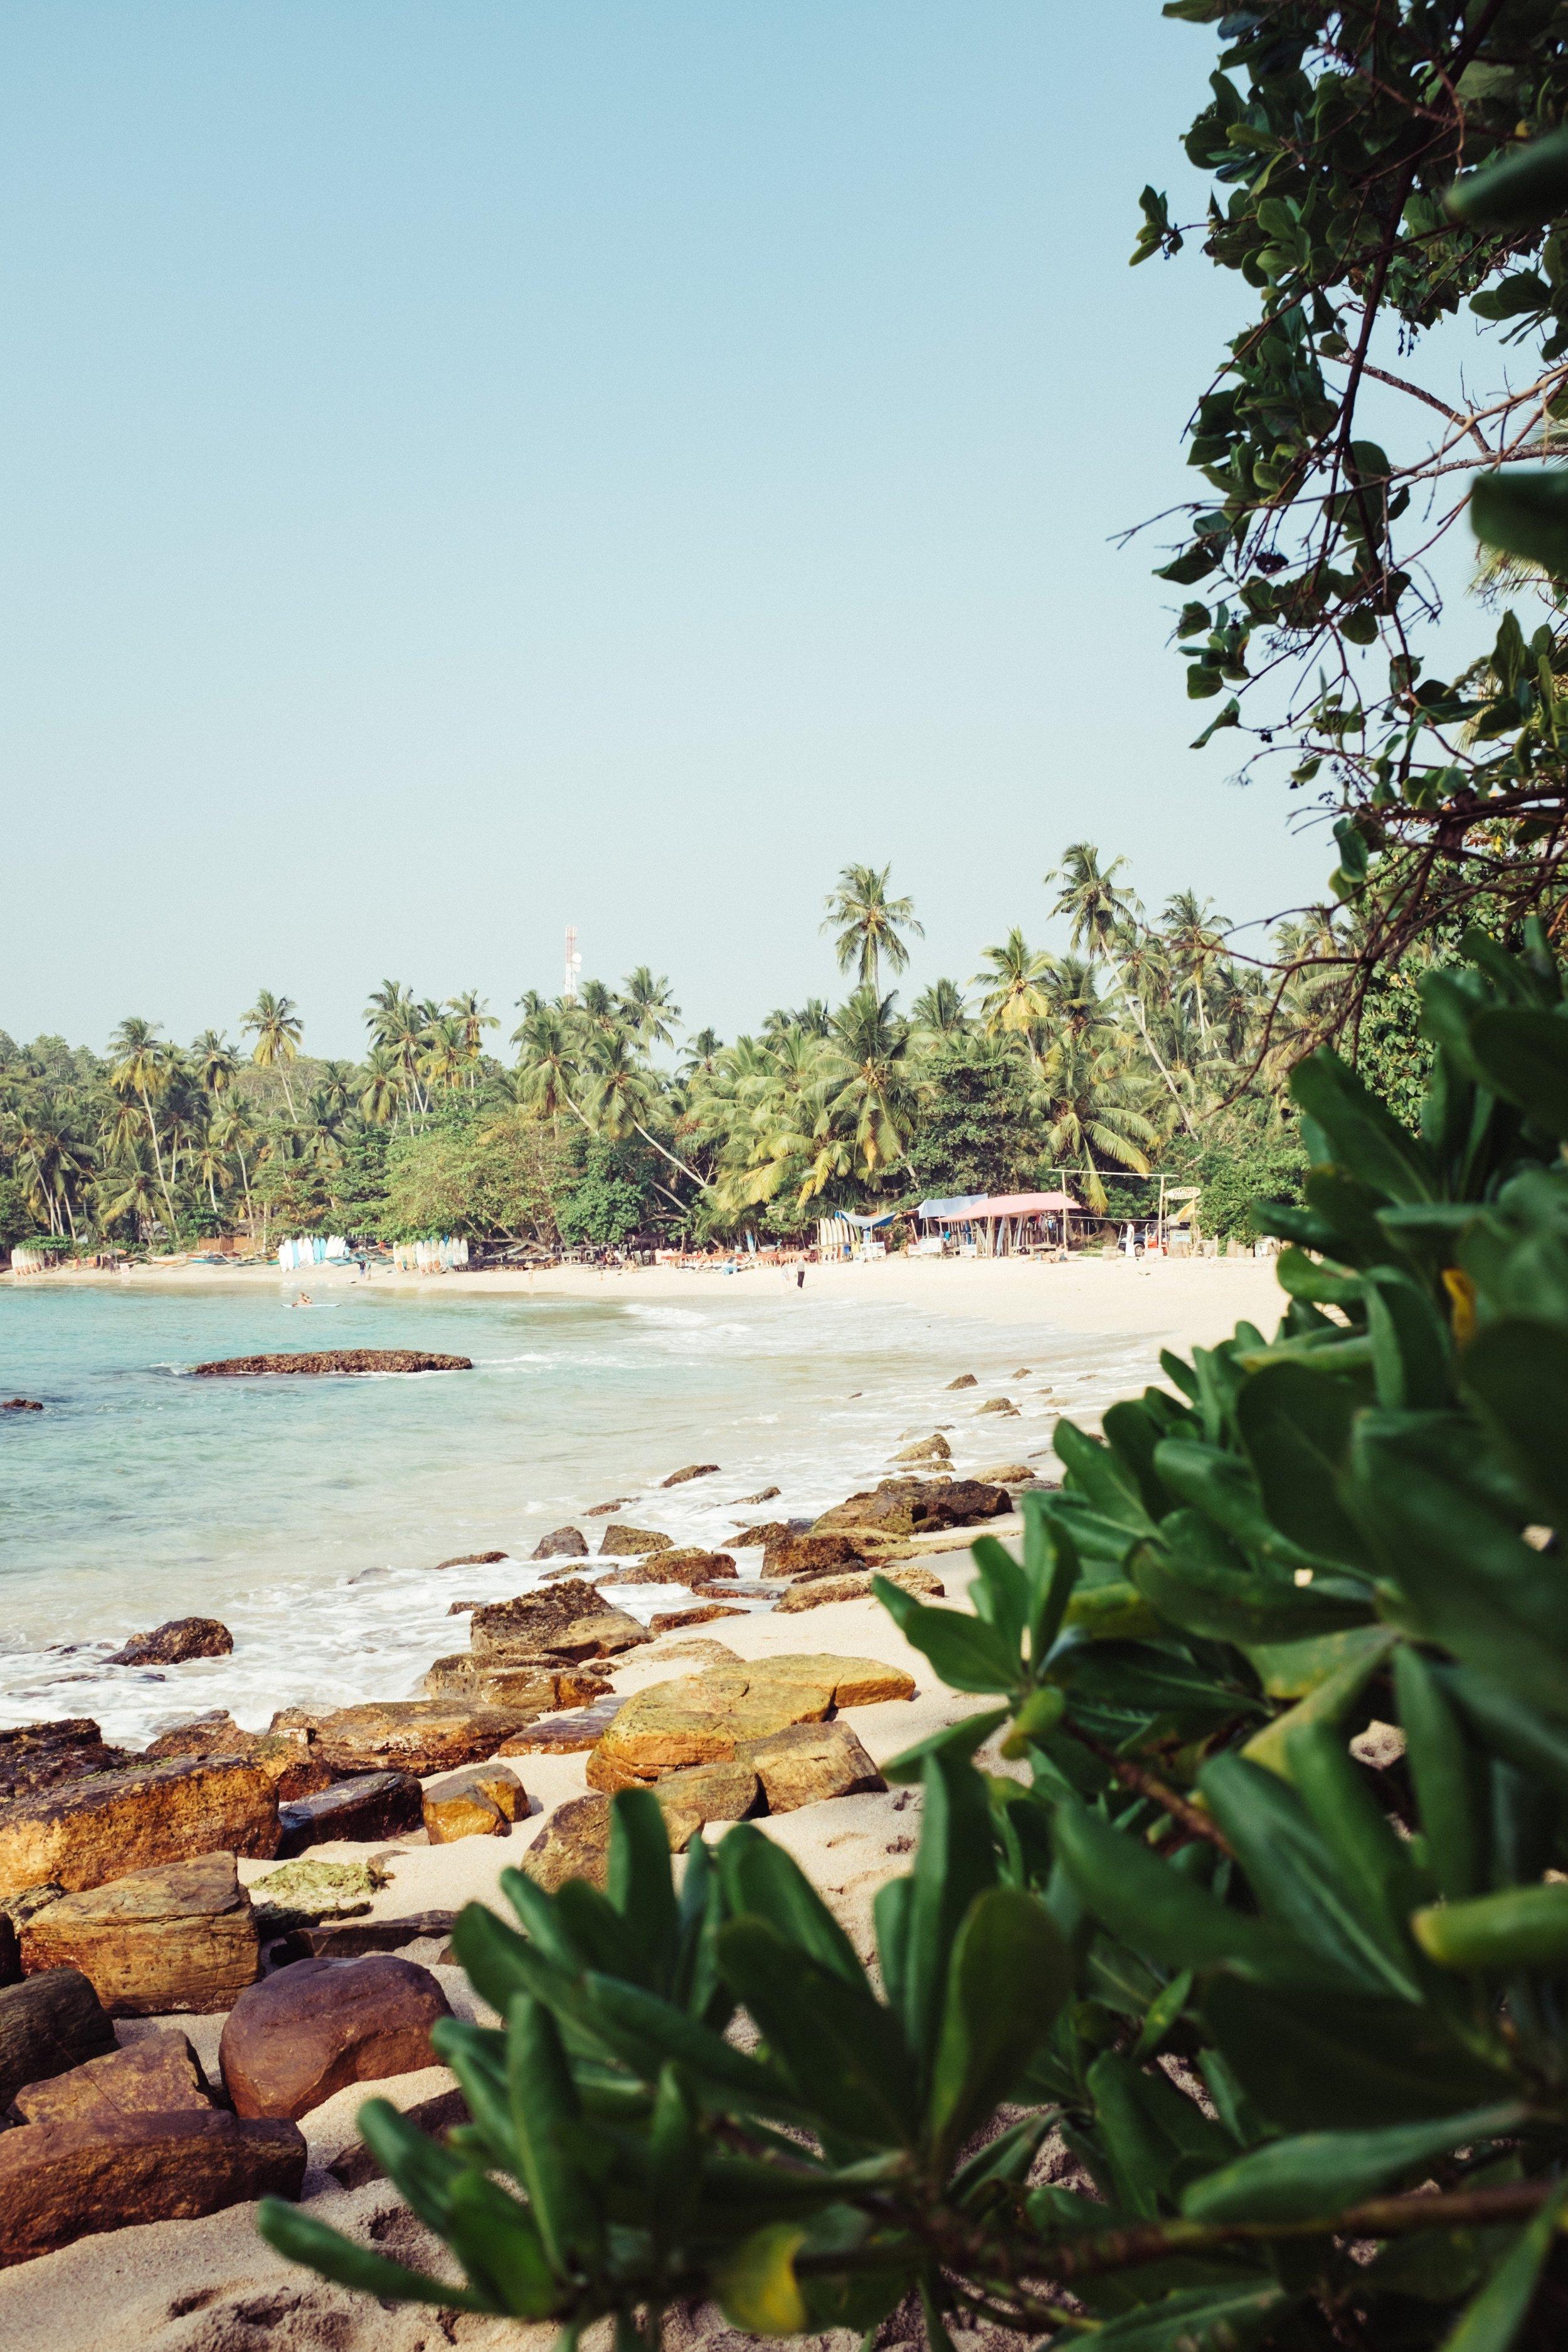 sri lanka beach what to pack travel tips